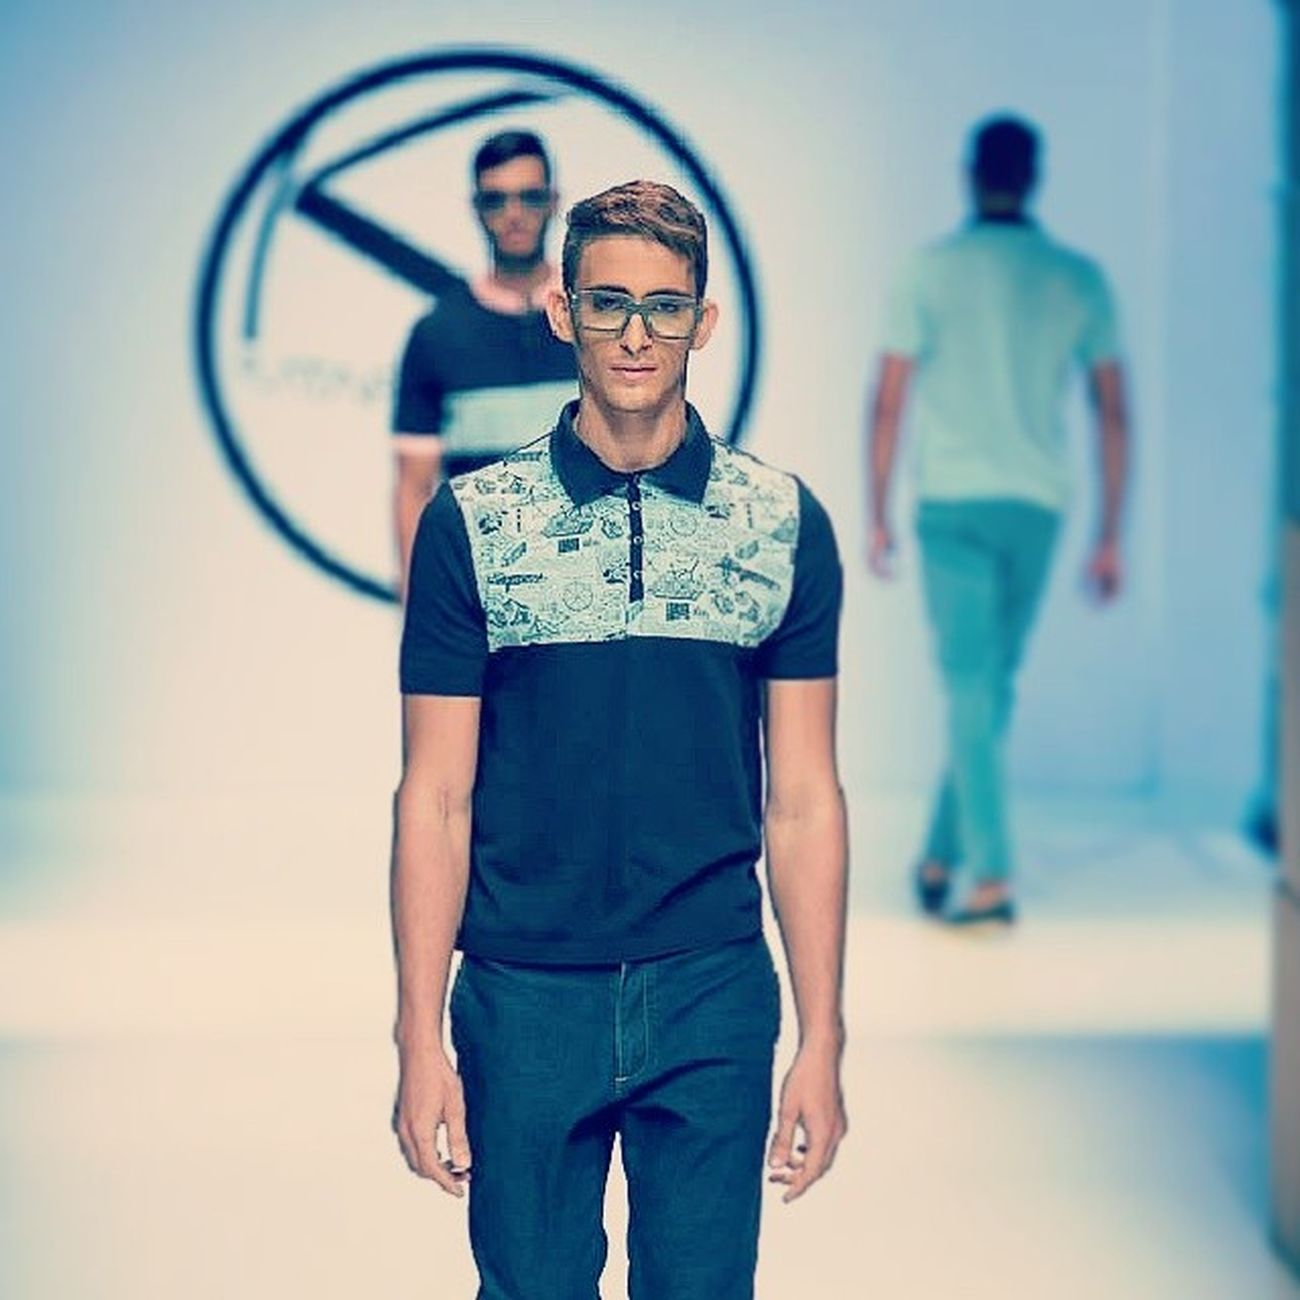 Mon & Velarde - Pk2014 Moda Estilodevida Plataformak negocios runway model informamodels @chachaposada behappy